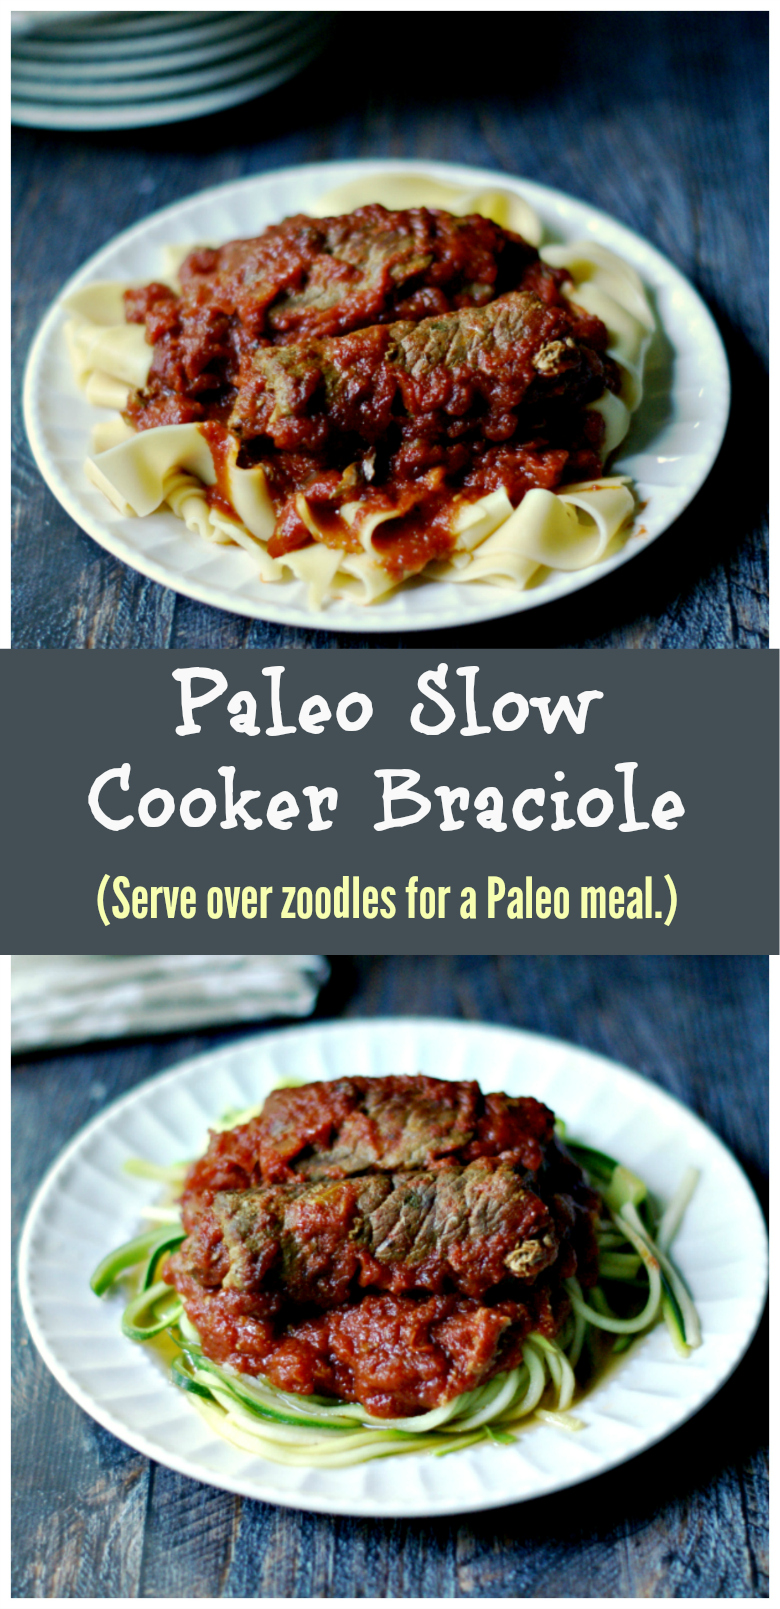 Paleo-Slow-Cooker-Braciole-P